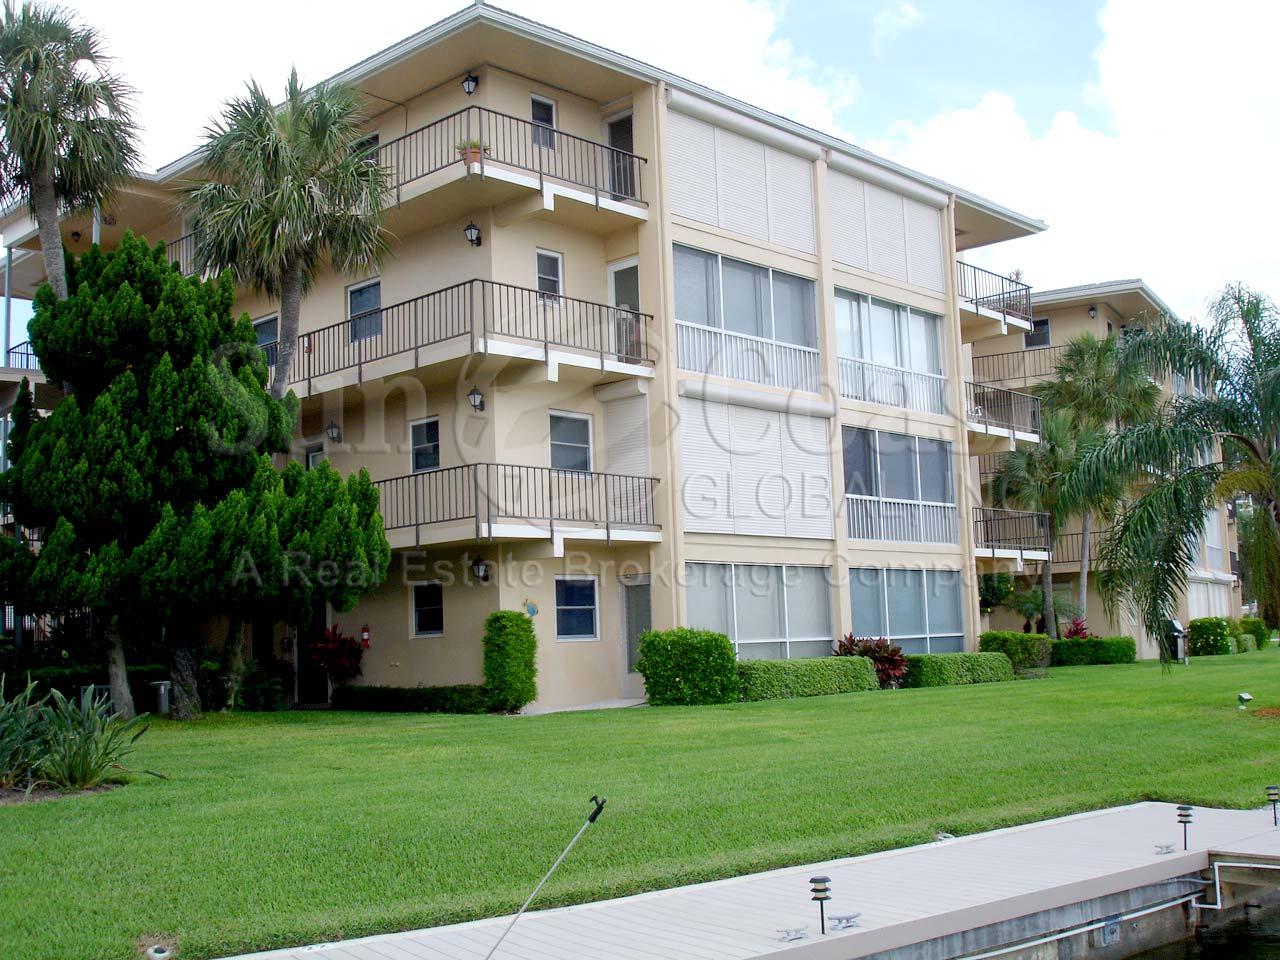 HARBORSIDE GARDENS at MOORINGS Real Estate NAPLES Florida Fla Fl